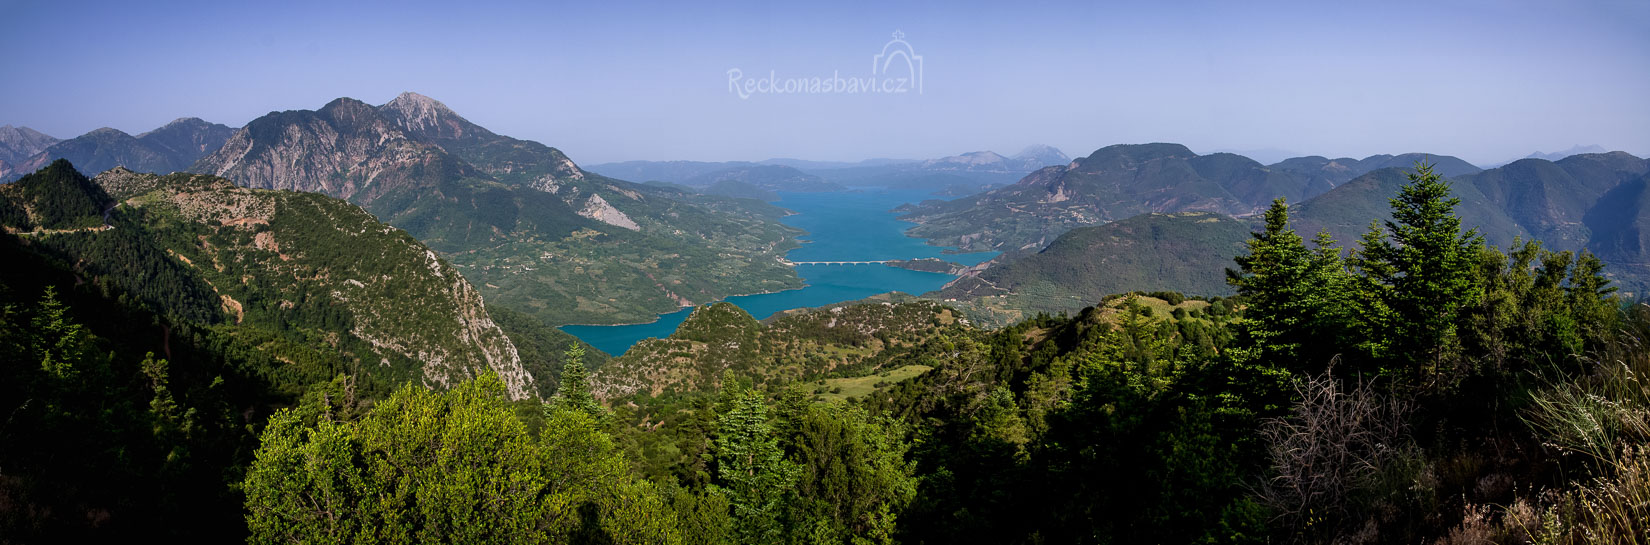 Kremasta lake - Evritania